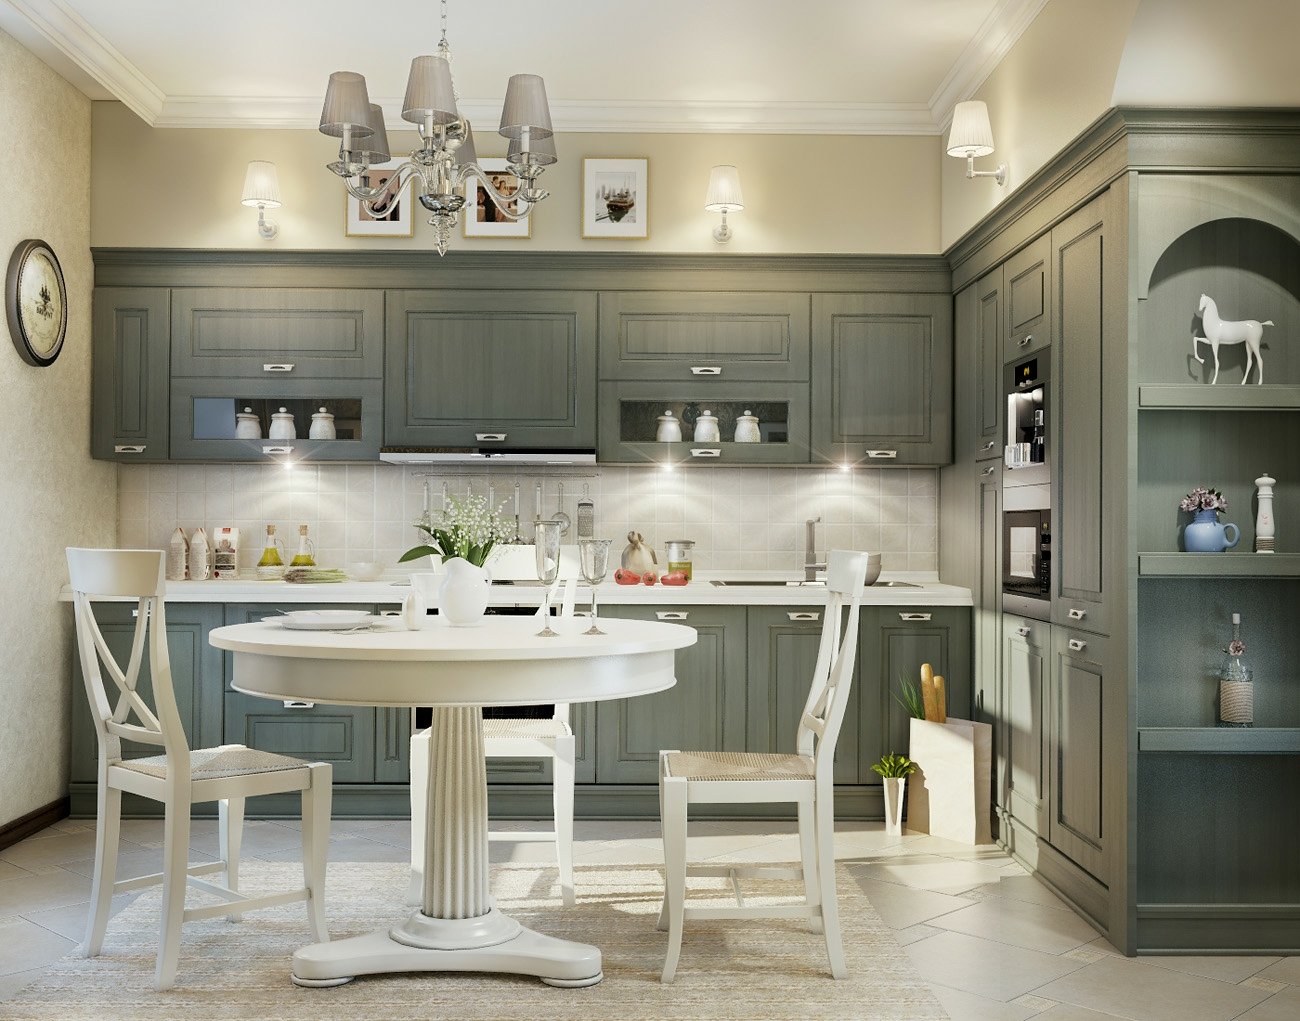 11 luxurious traditional kitchen ideas traditional kitchen ideas 11 Luxurious Traditional Kitchen Ideas